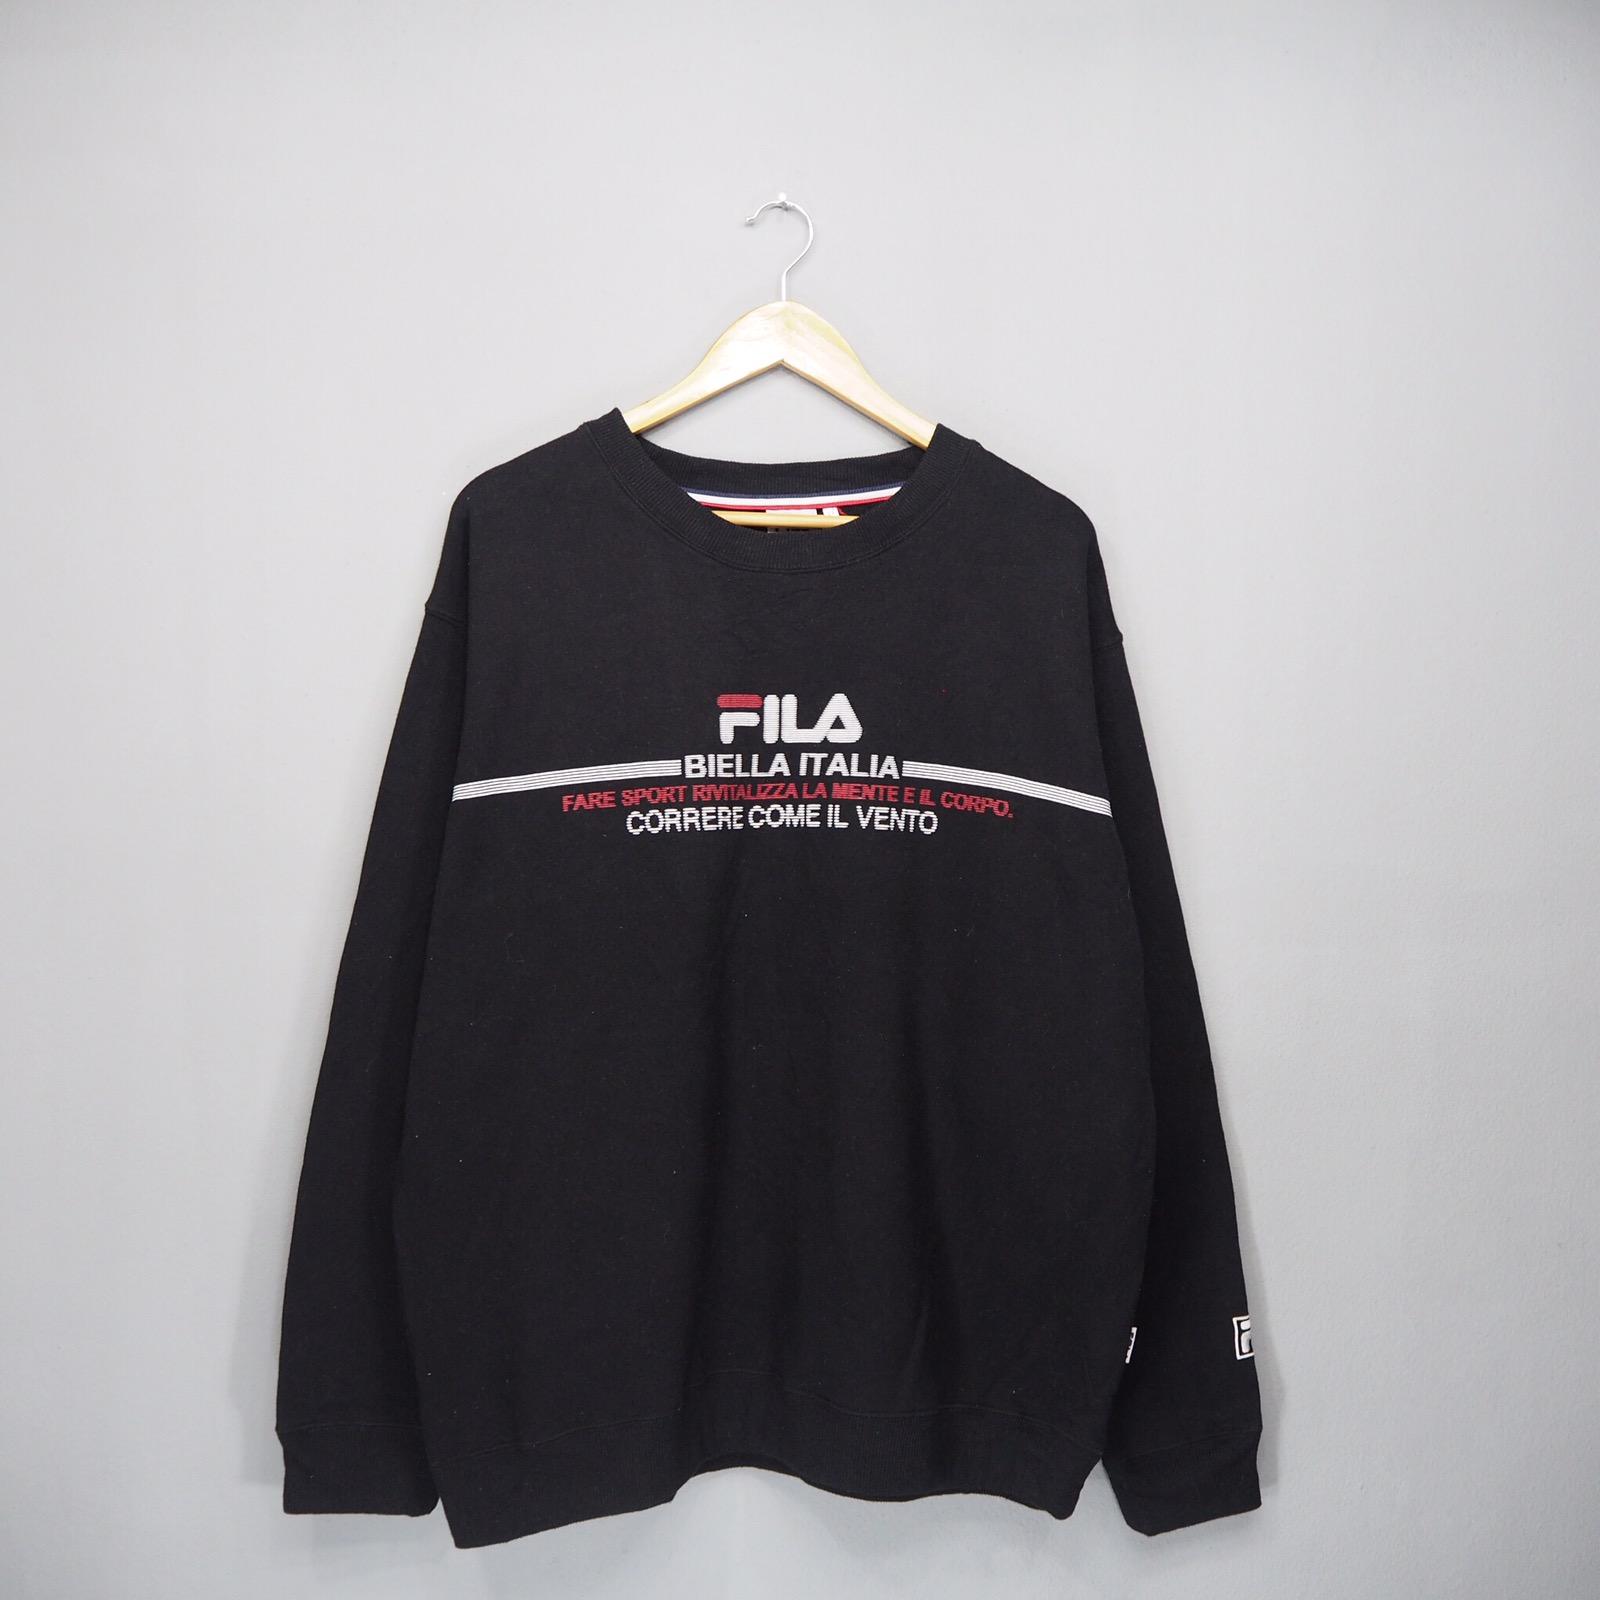 b9b12e618159 Fila Rare!! Fila Sweatshirt Big Logo Pullover Jumper Size xl - Sweatshirts    Hoodies for Sale - Grailed